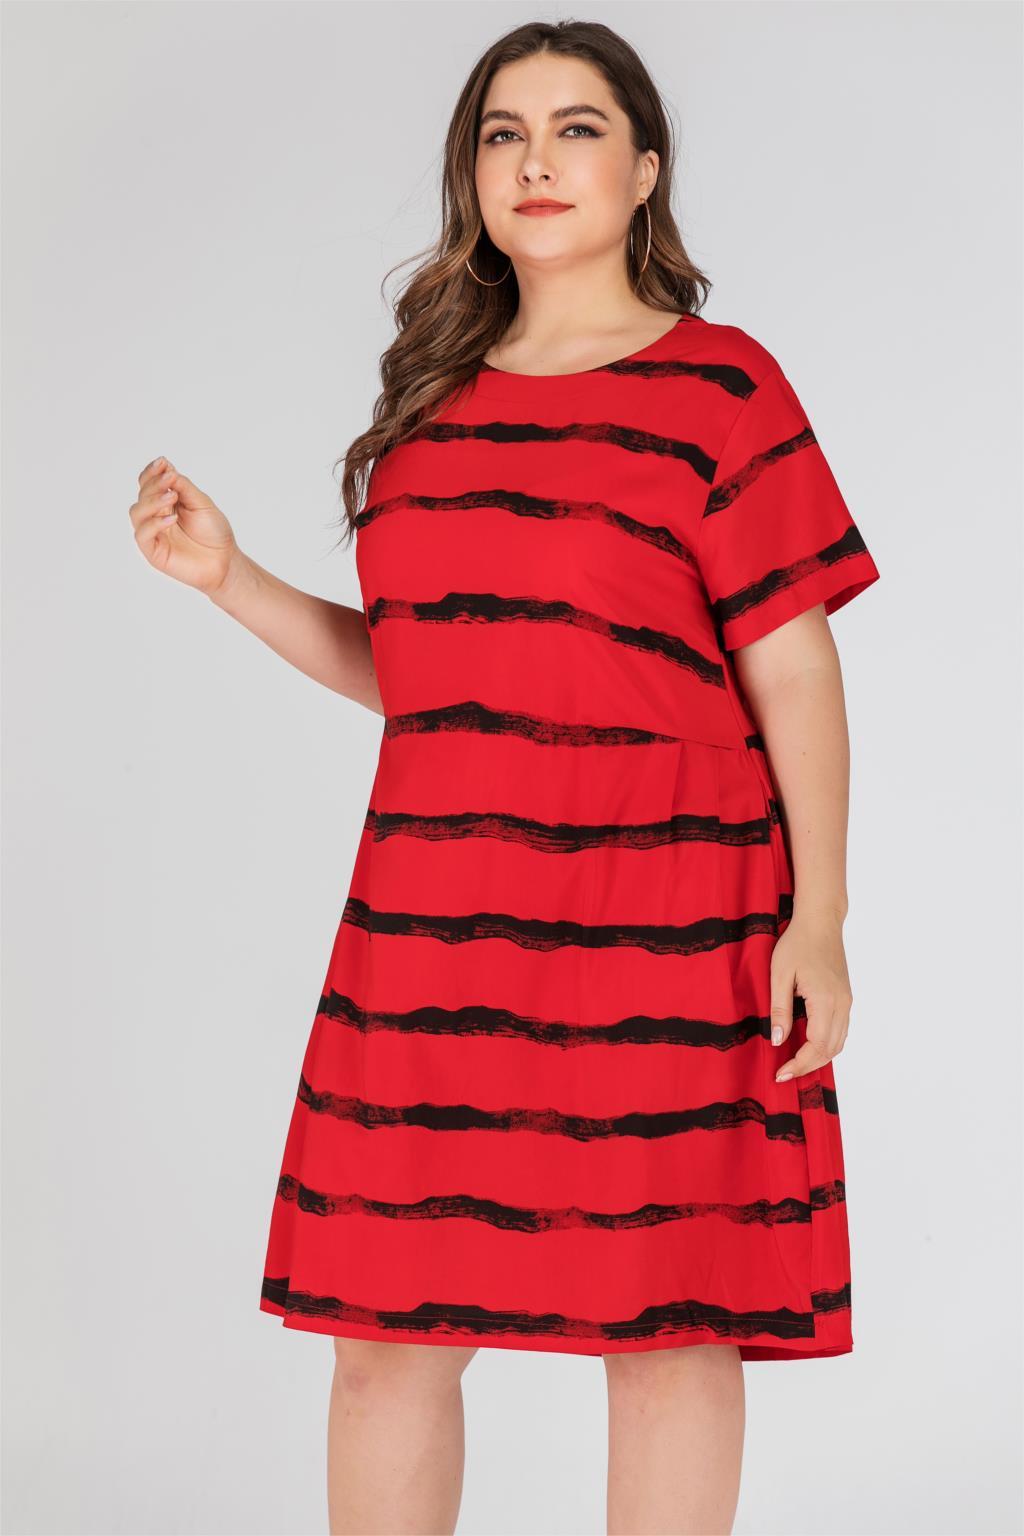 Plus Size 5XL Casual Dress Women Summer Short Sleeve Striped Print Loose Oversized Dress Knee Length Ladies Tunic Midi Dresses